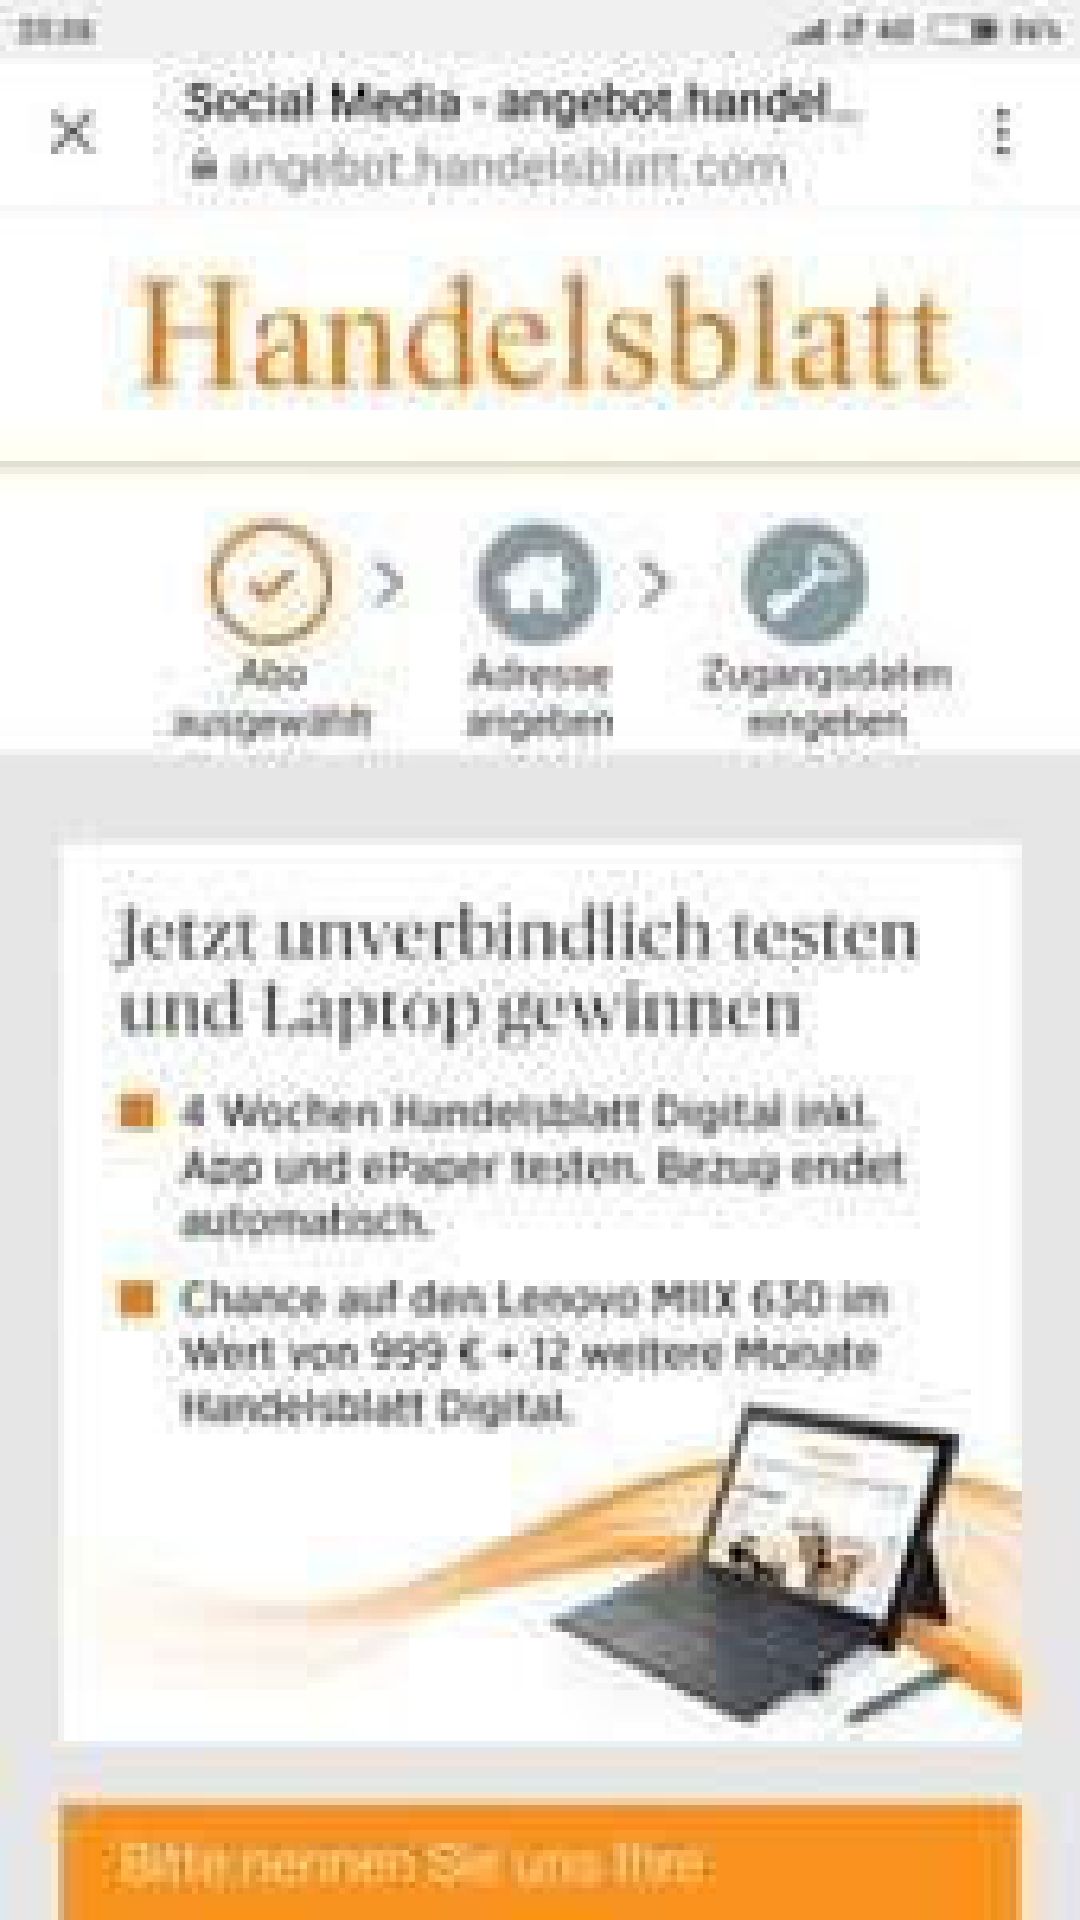 Handelsblatt App + ePaper 4 Wochen gratis | Bezug endet automatisch!